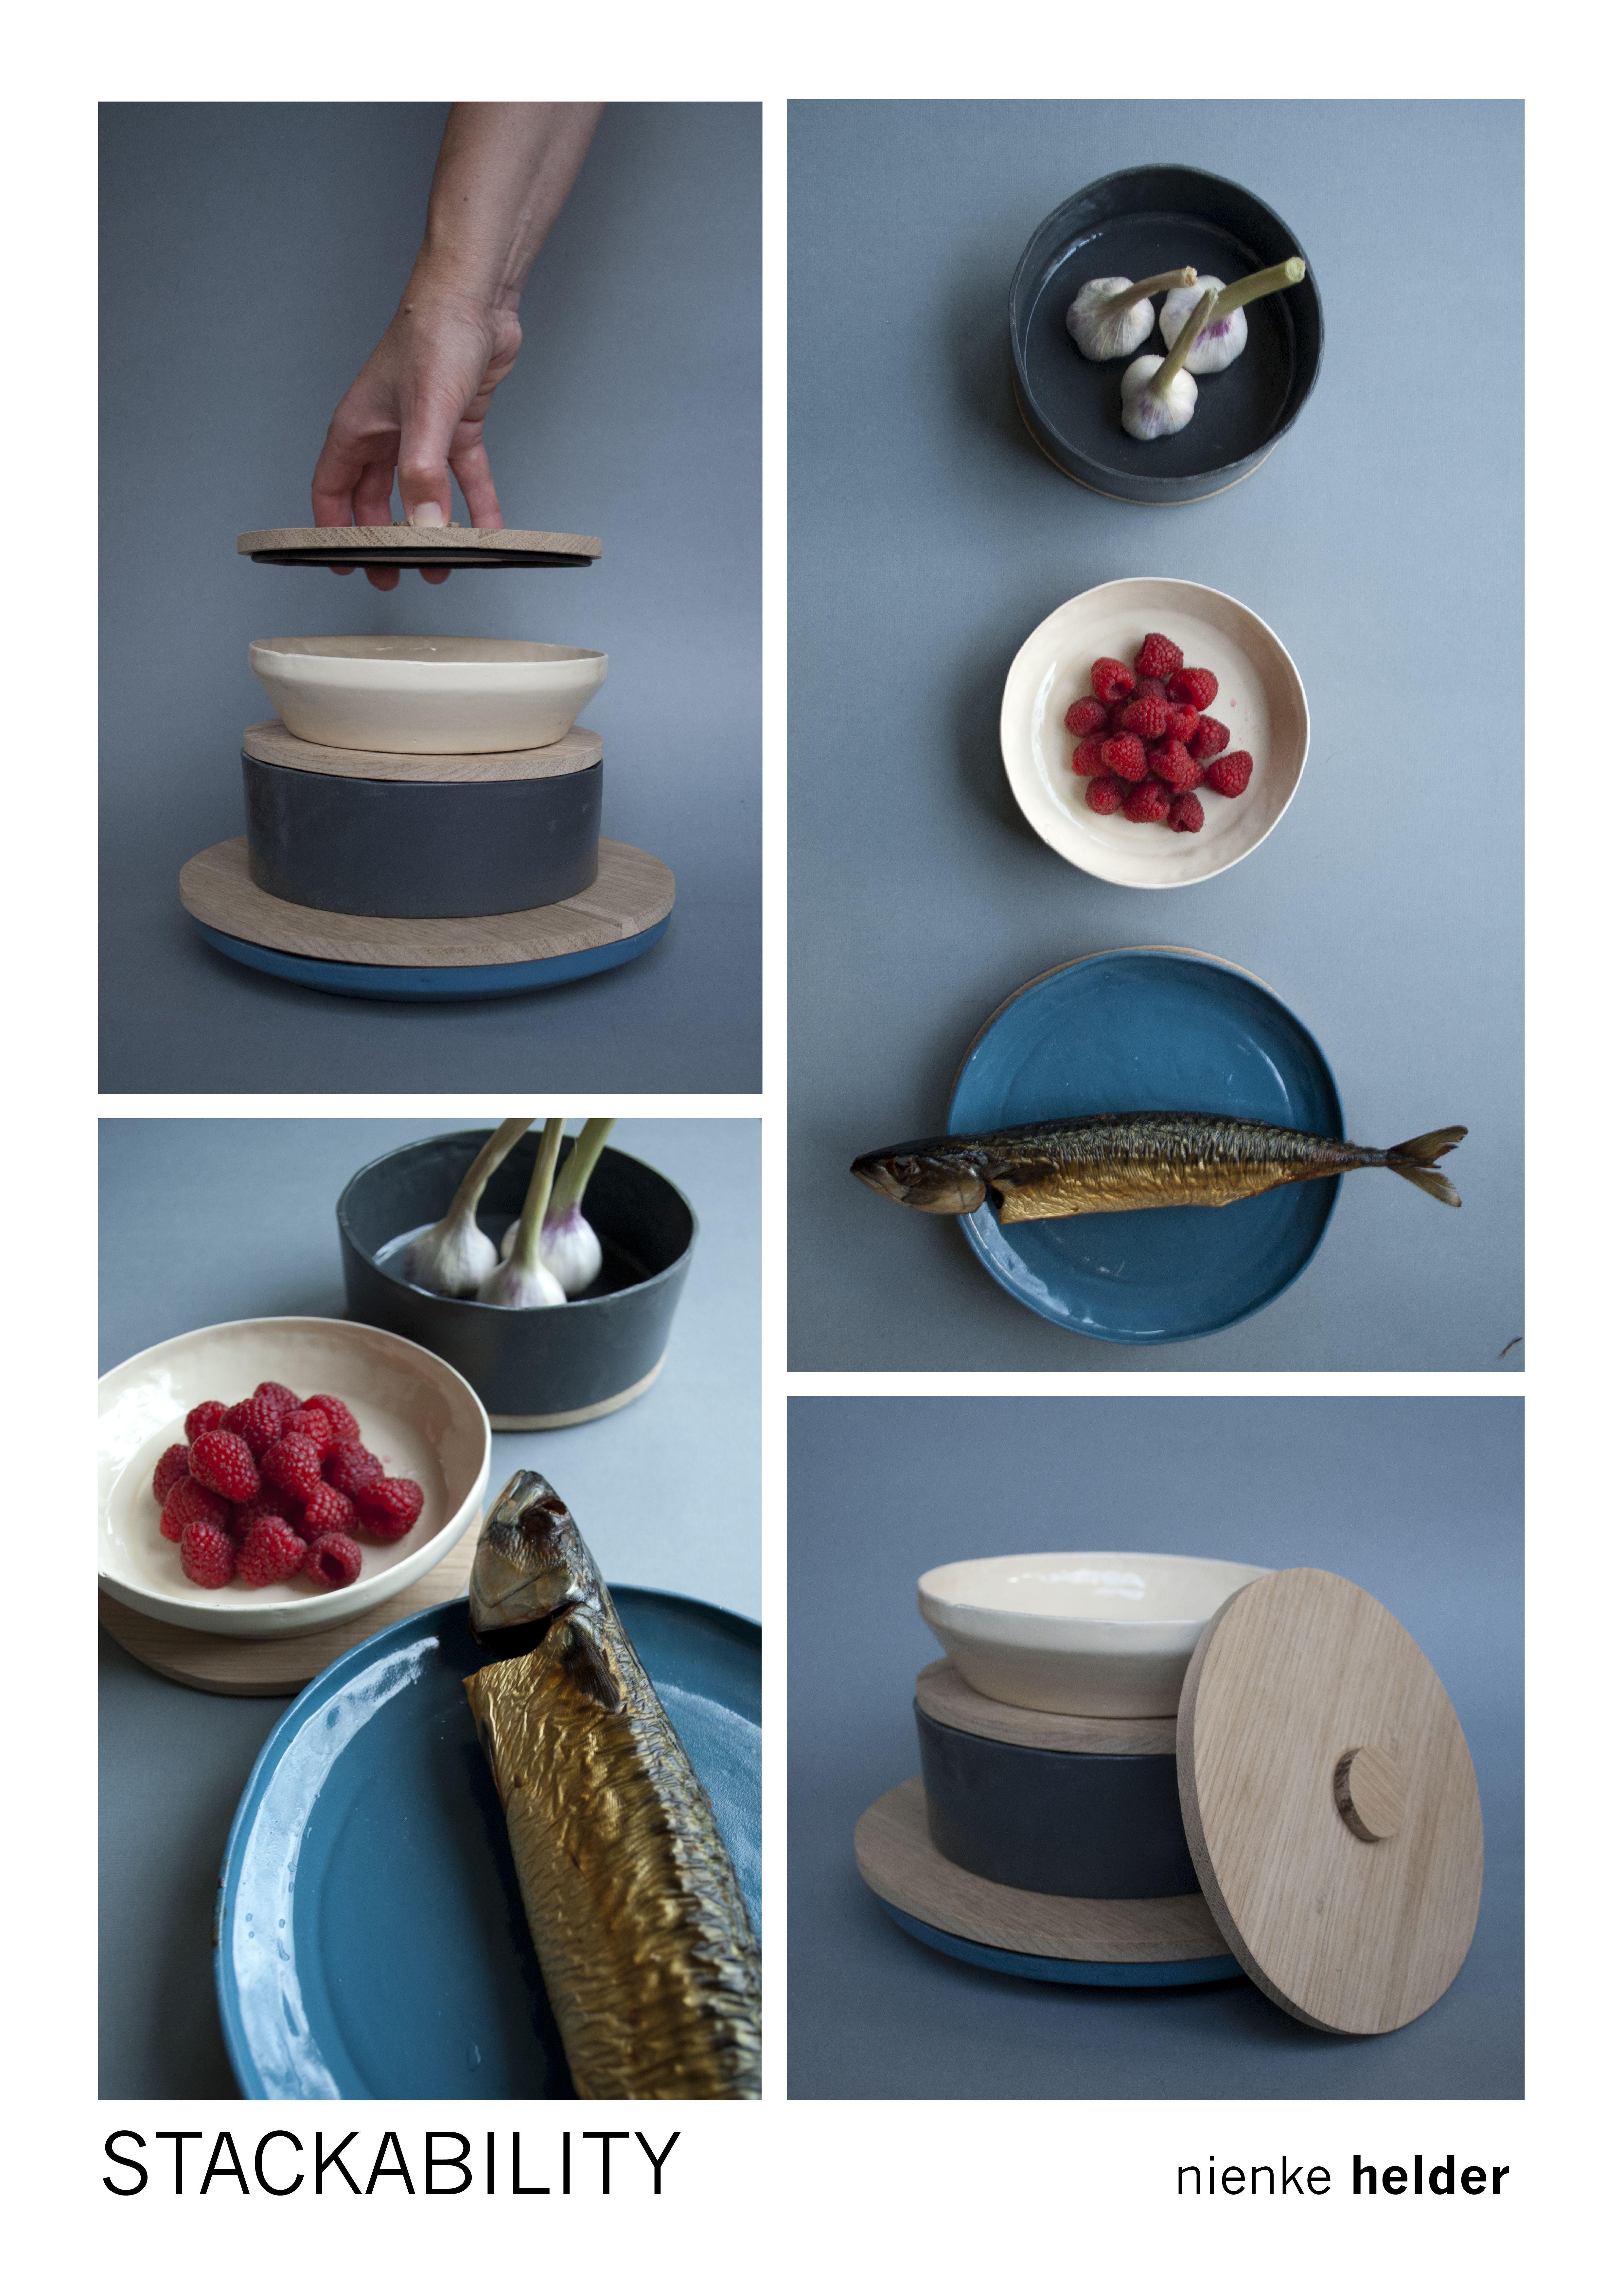 Stackable Table ware - ceramics - Nienke Helder - Stackability - Tableware design